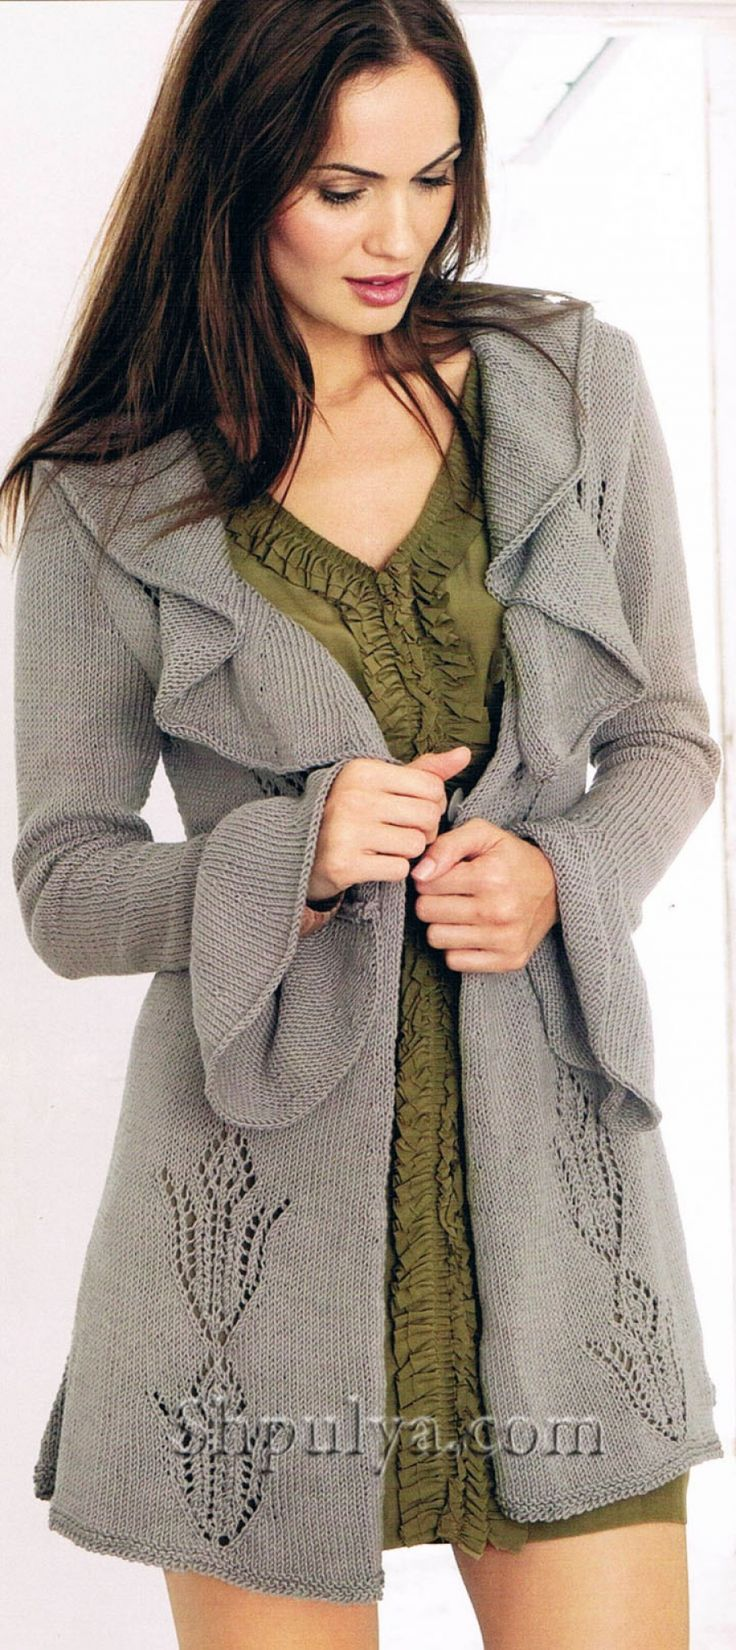 Короткое пальто с ажурным узором, вязаное спицами